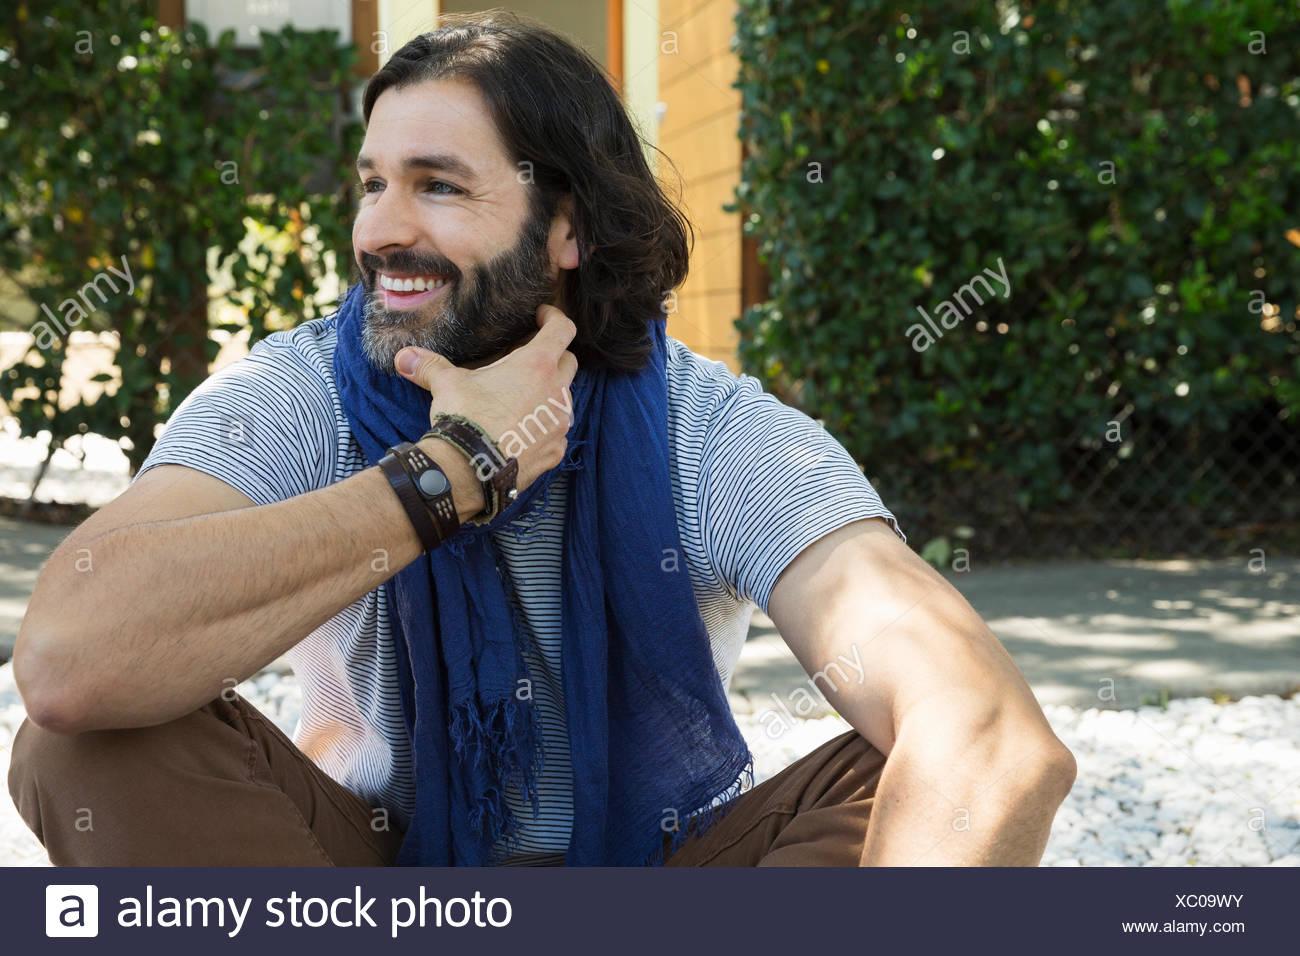 Smiling man with beard et foulard à l'écart Photo Stock